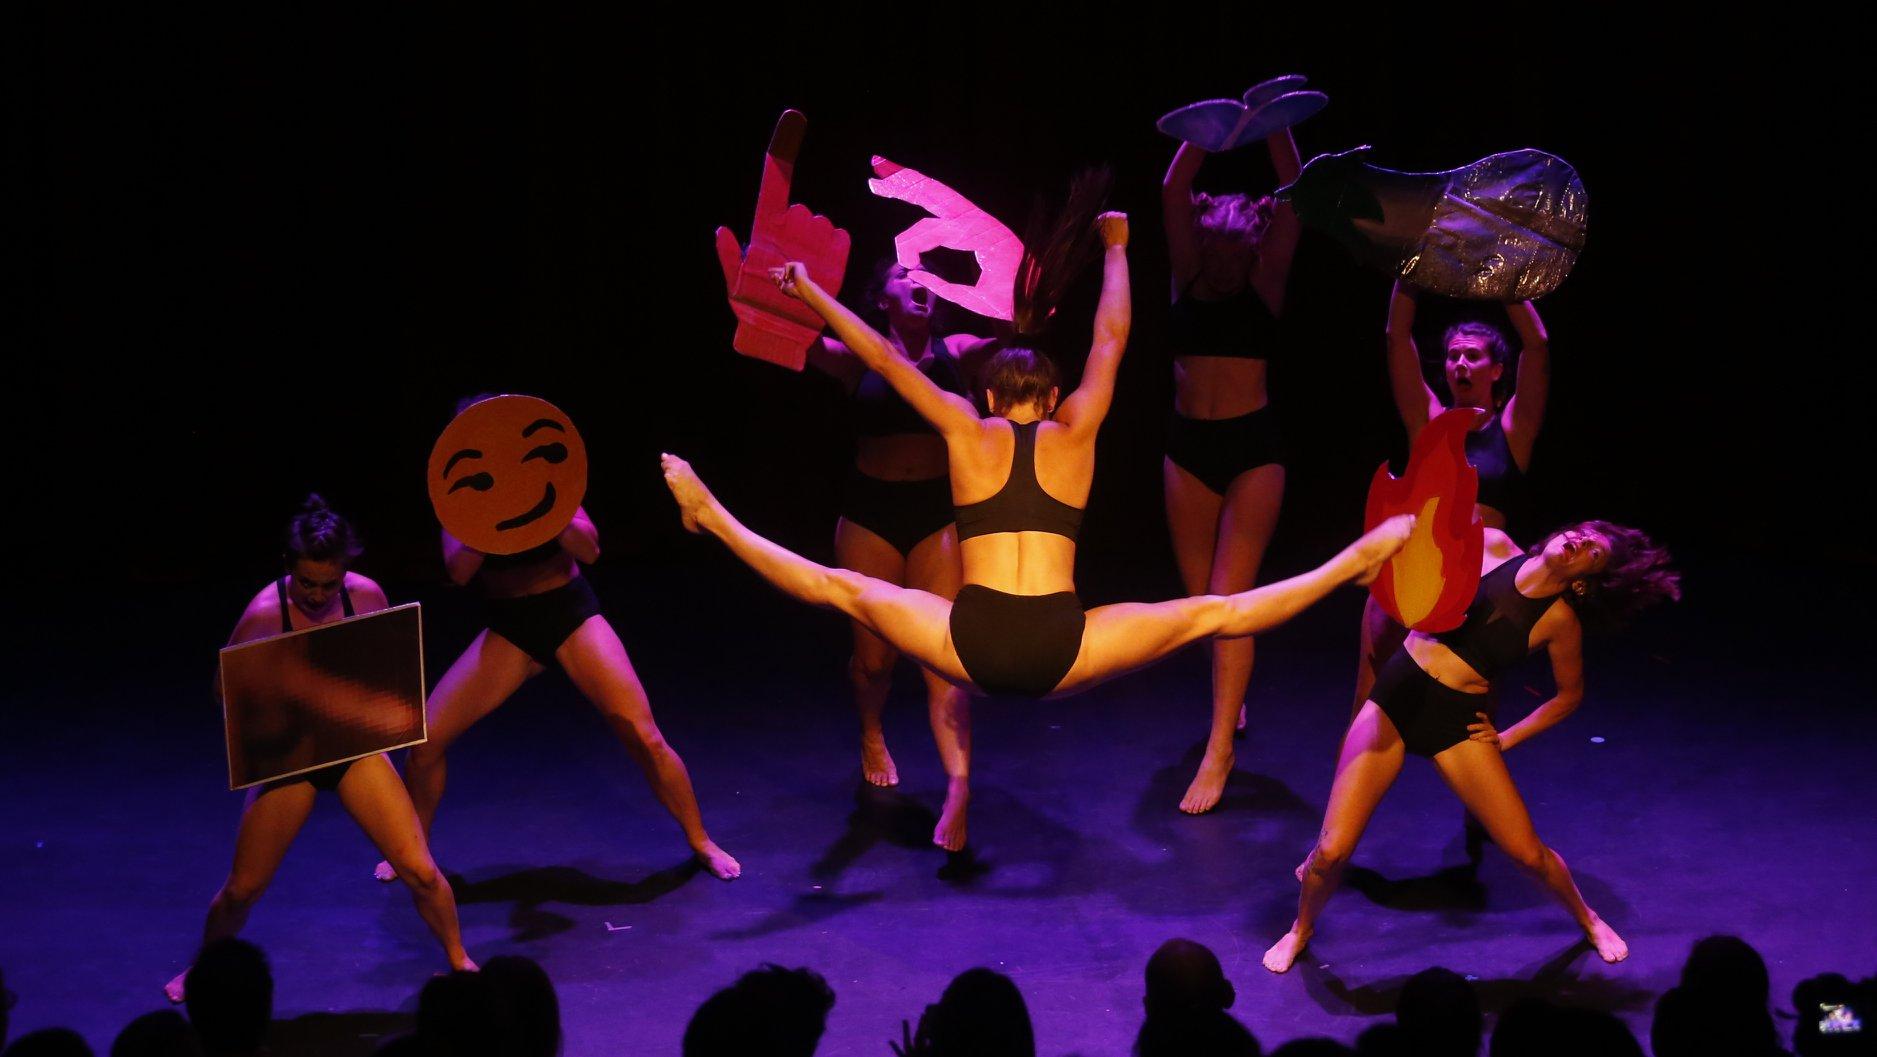 'YUCK Circus', by Yuck Circus